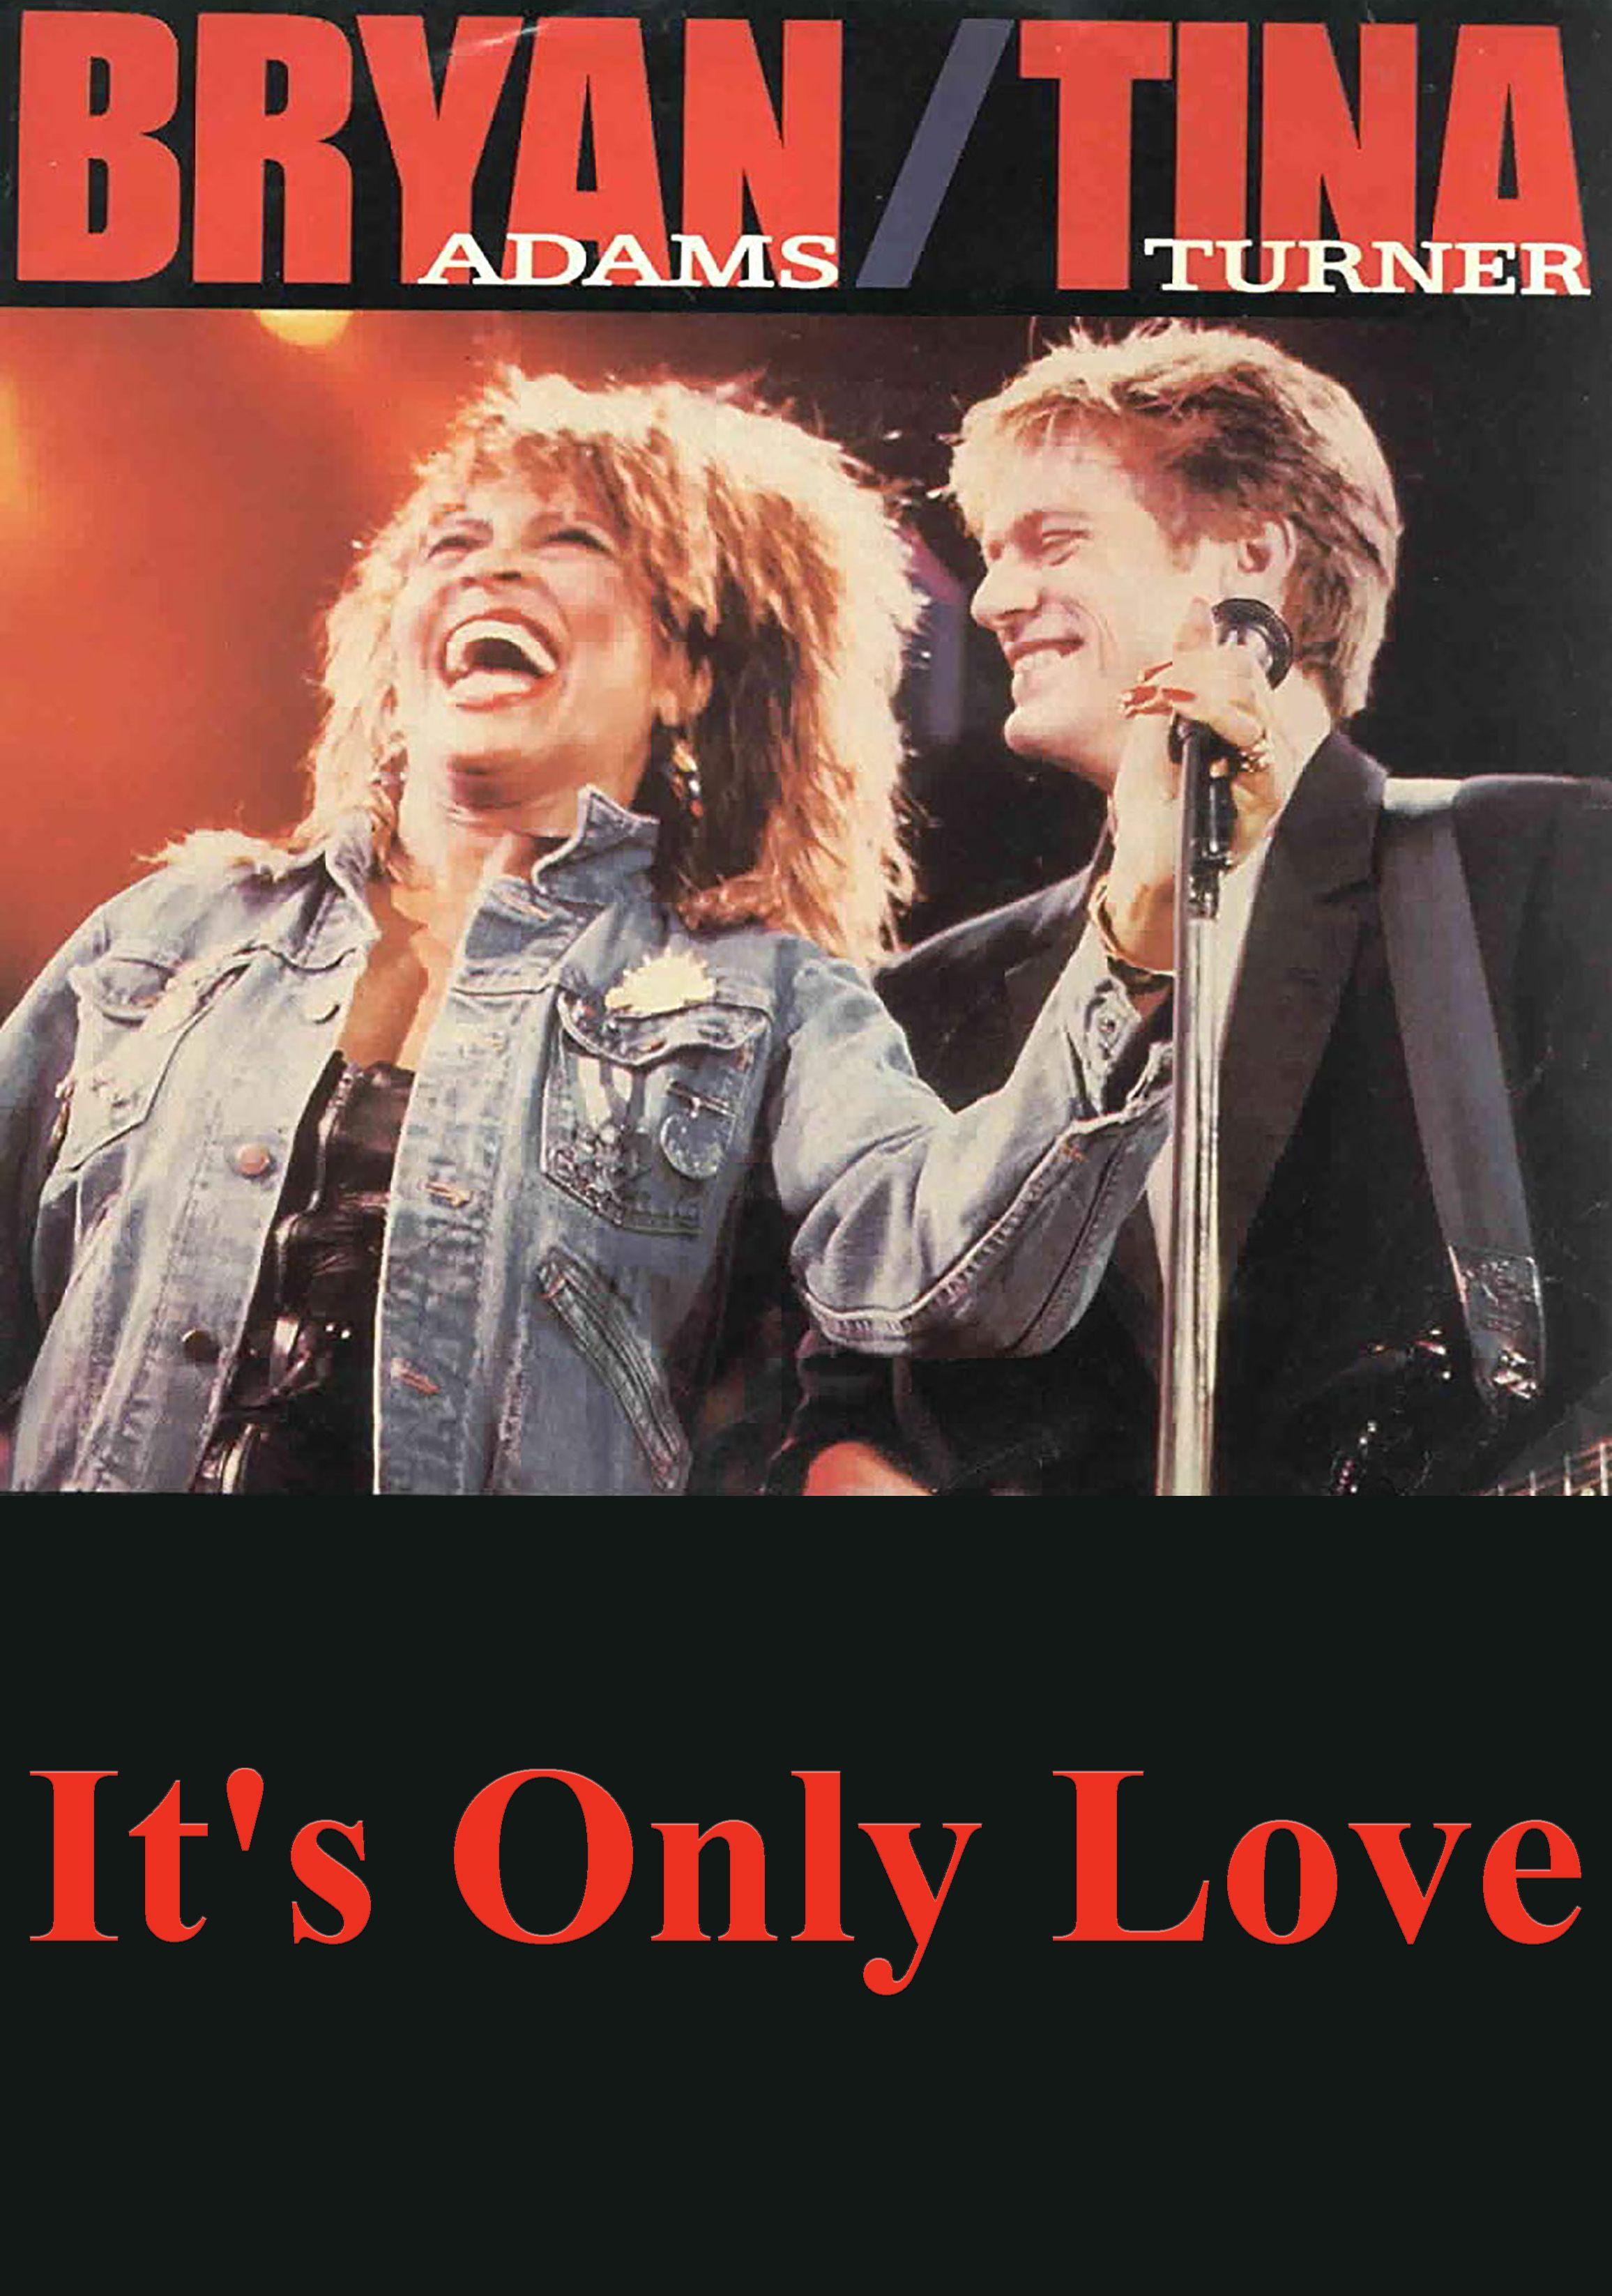 It S Only Love By Bryan Adams Sheet Music Free Sheet Music Piano Sheet Music Sheet Music